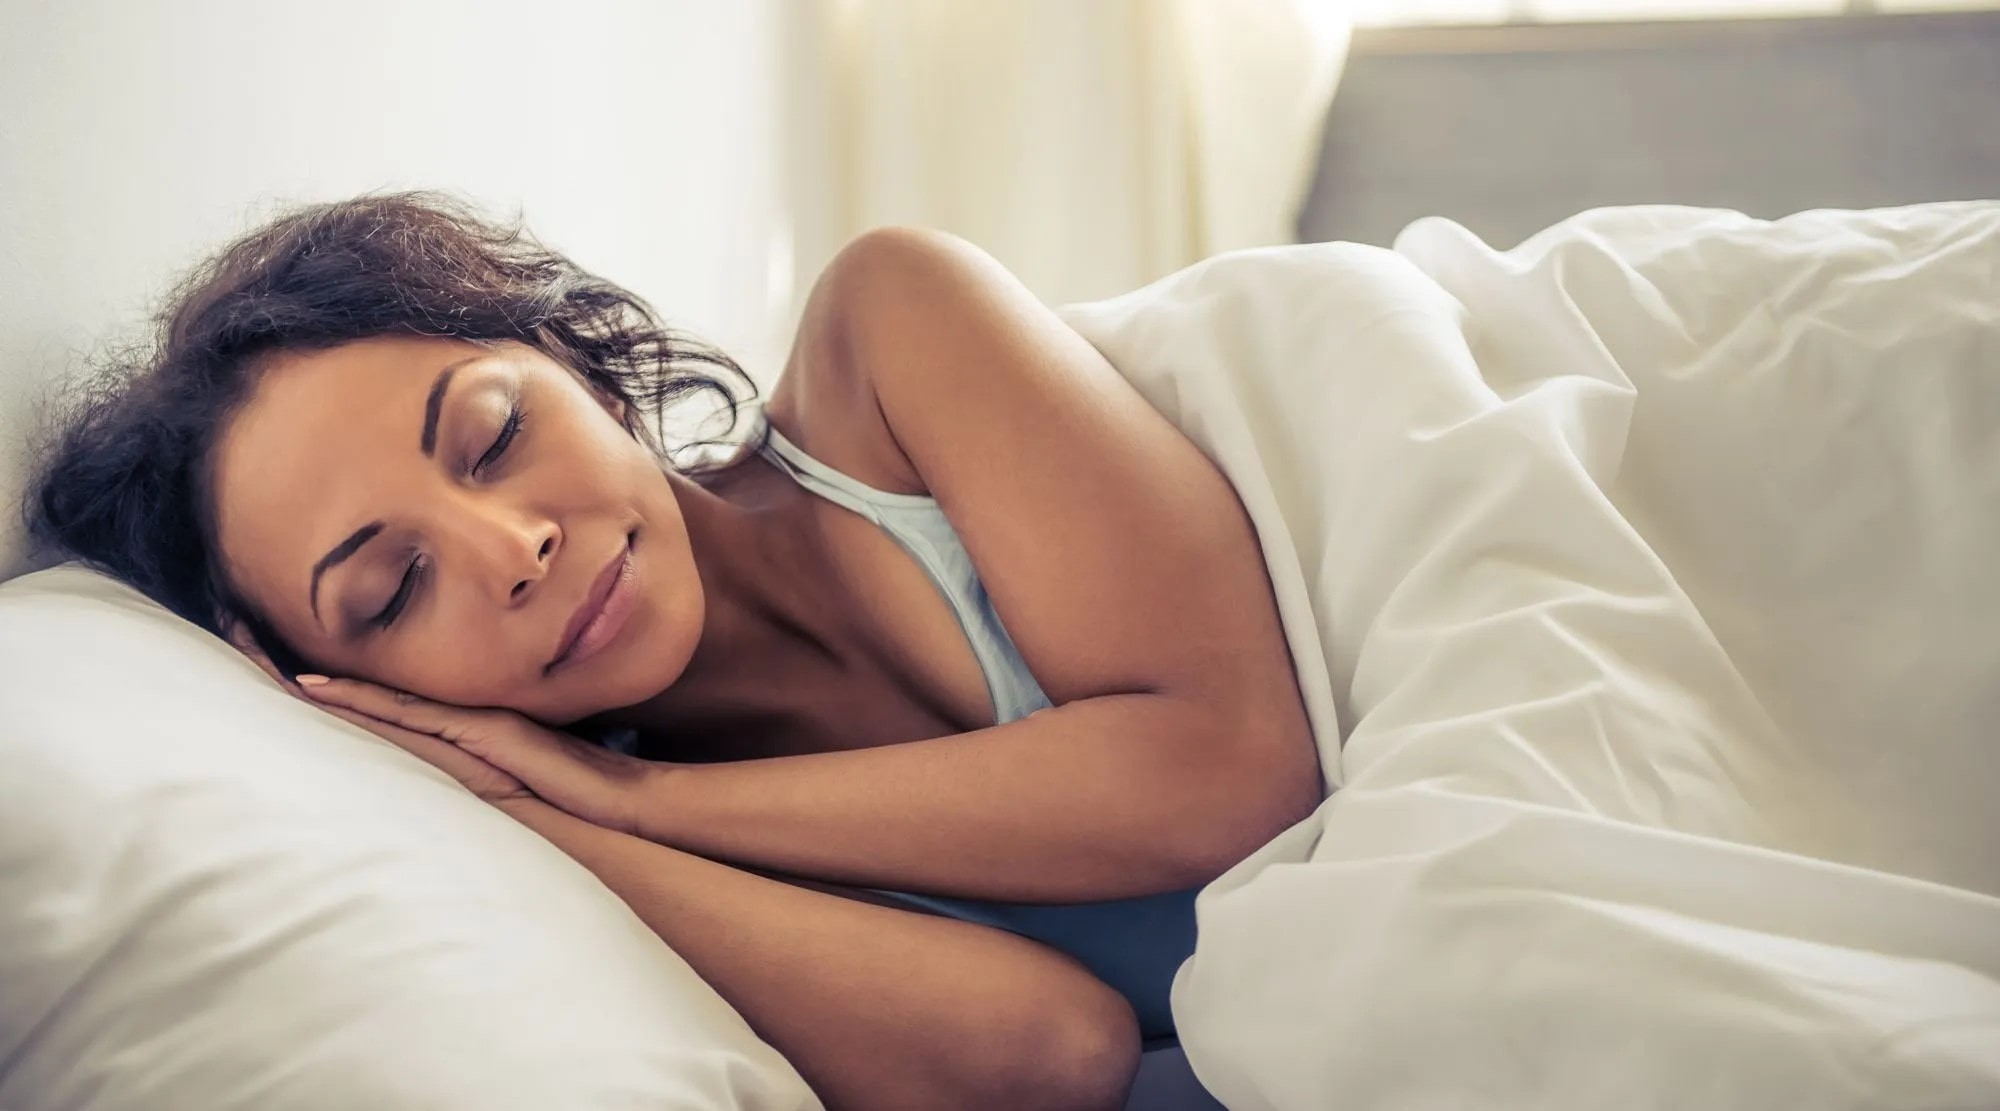 woman sleeping under a white duvet.